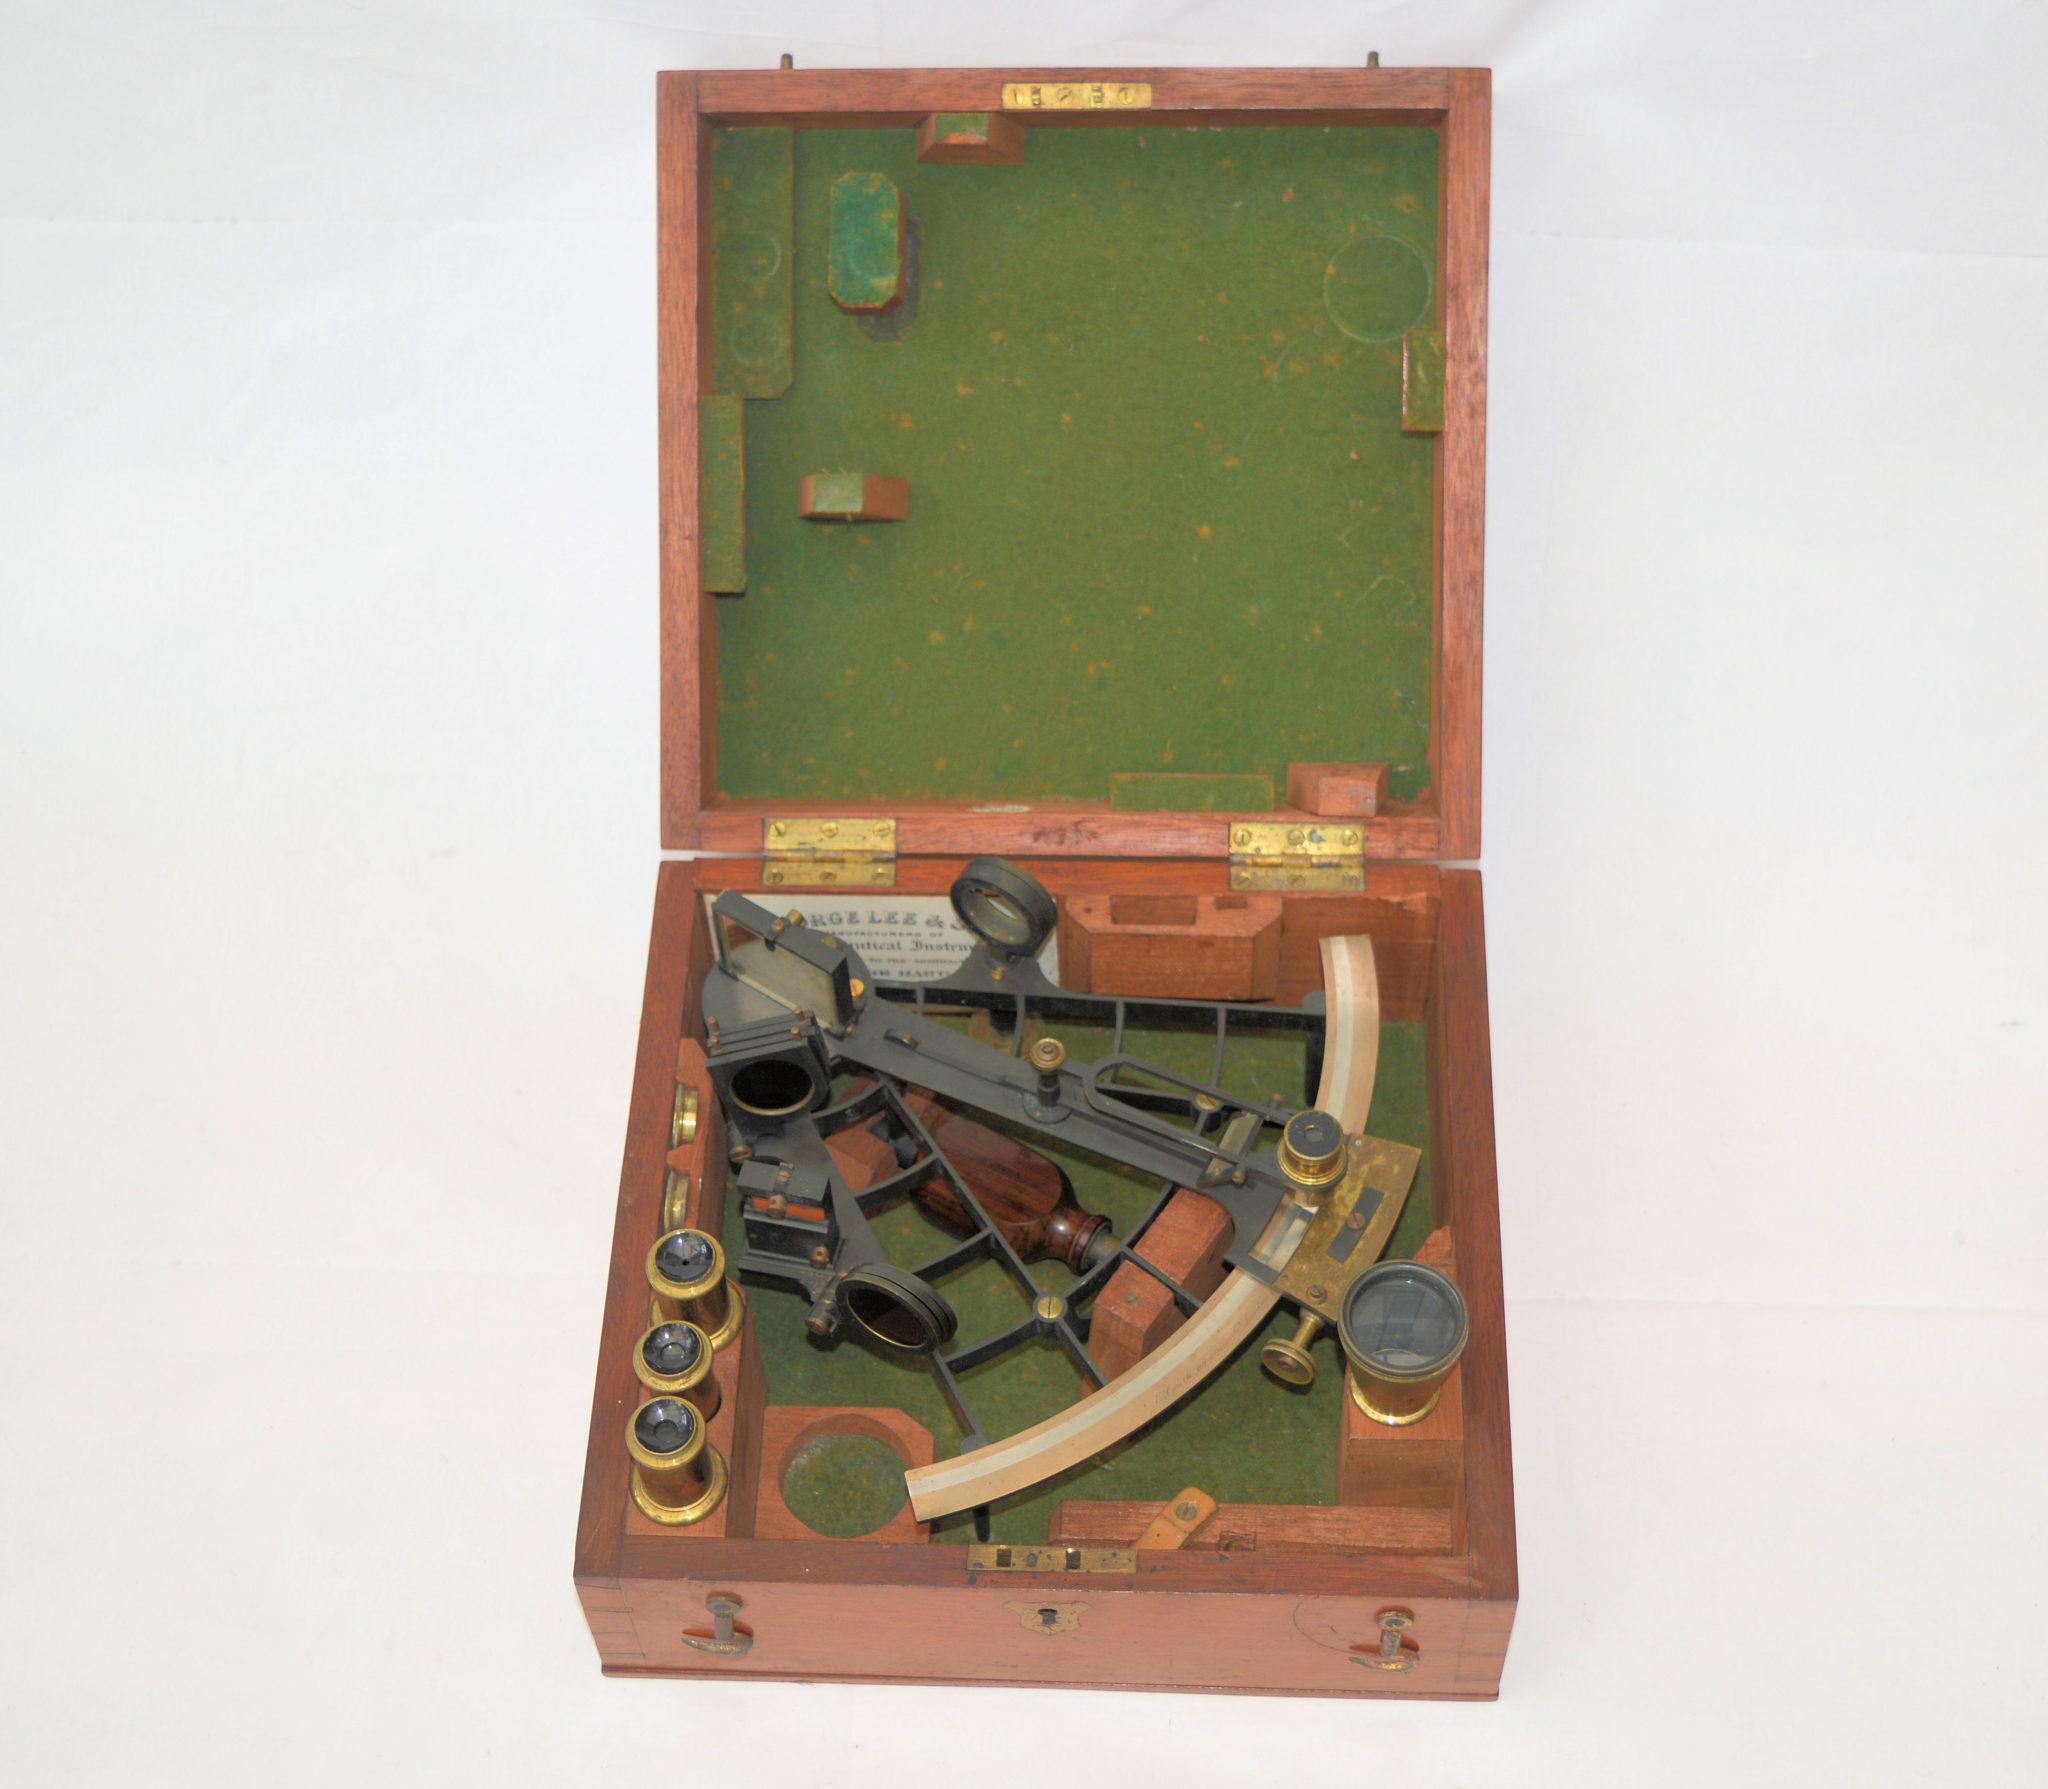 Ladder frame sextant. The former property of Admiral Sir Charles John Briggs, K.C.B.